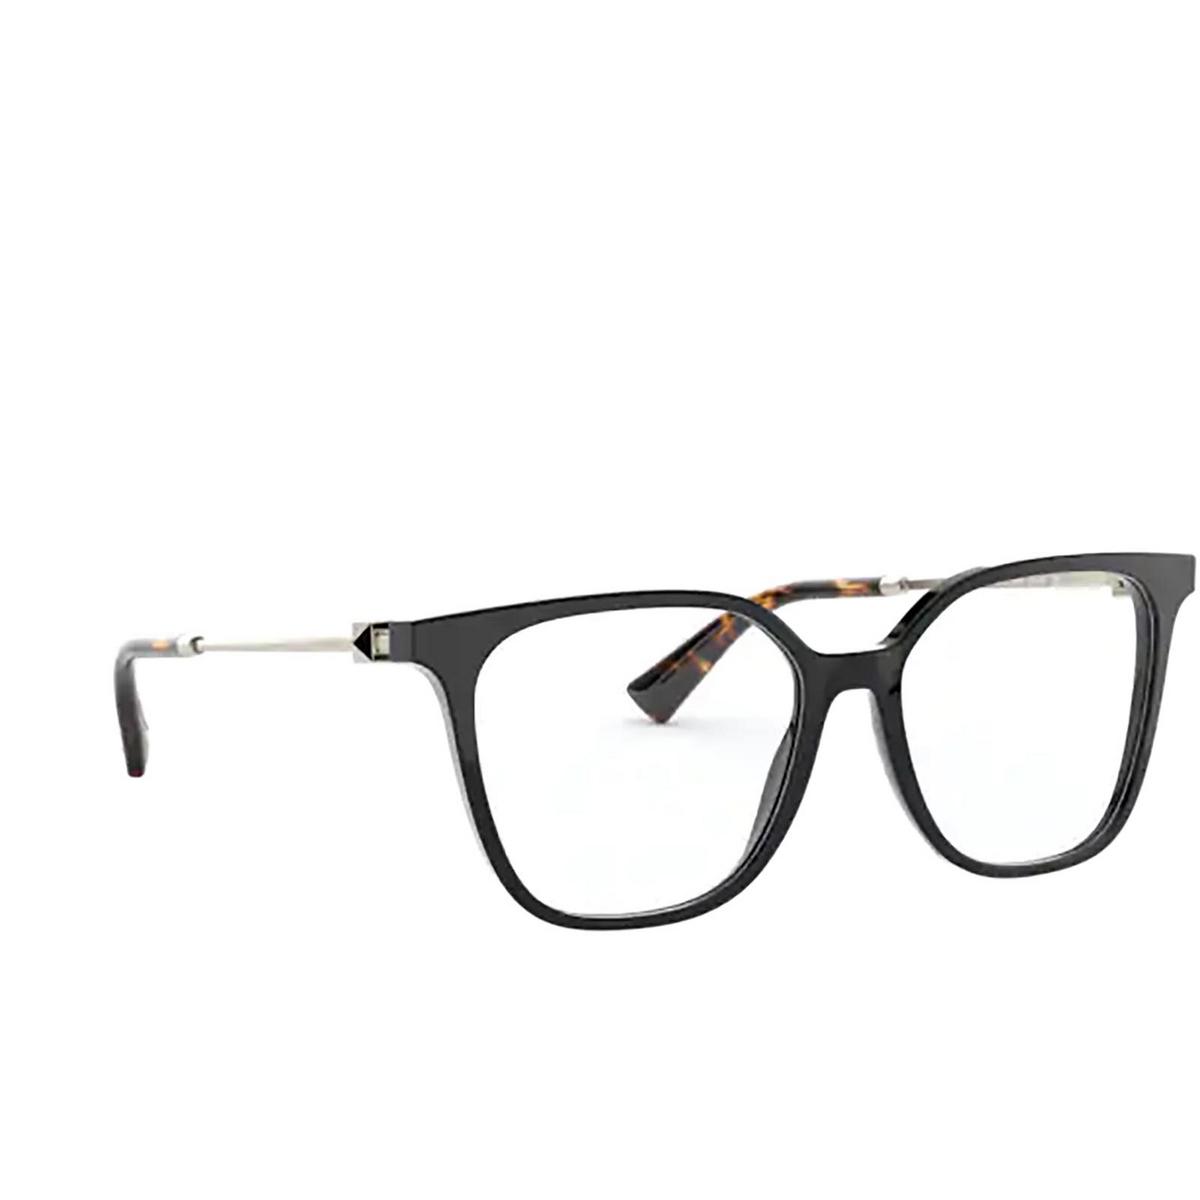 Valentino® Square Eyeglasses: VA3055 color Black 5001 - three-quarters view.